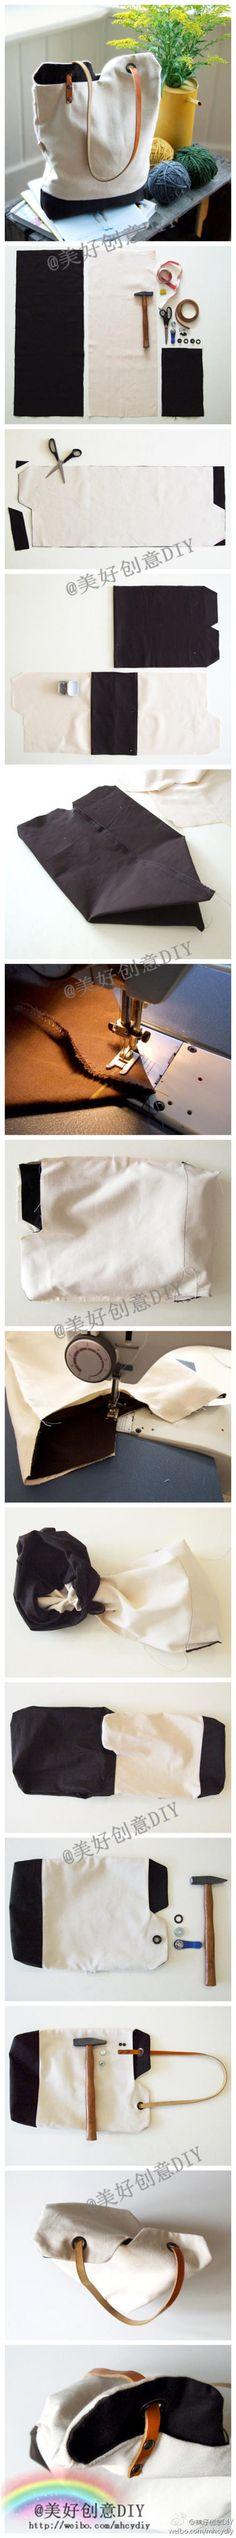 Pinspire - Bolsa original; picture tutorial with written instruction in english: http://www.designsponge.com/2010/10/diy-project-renskes-minimalist-tote-bag.html